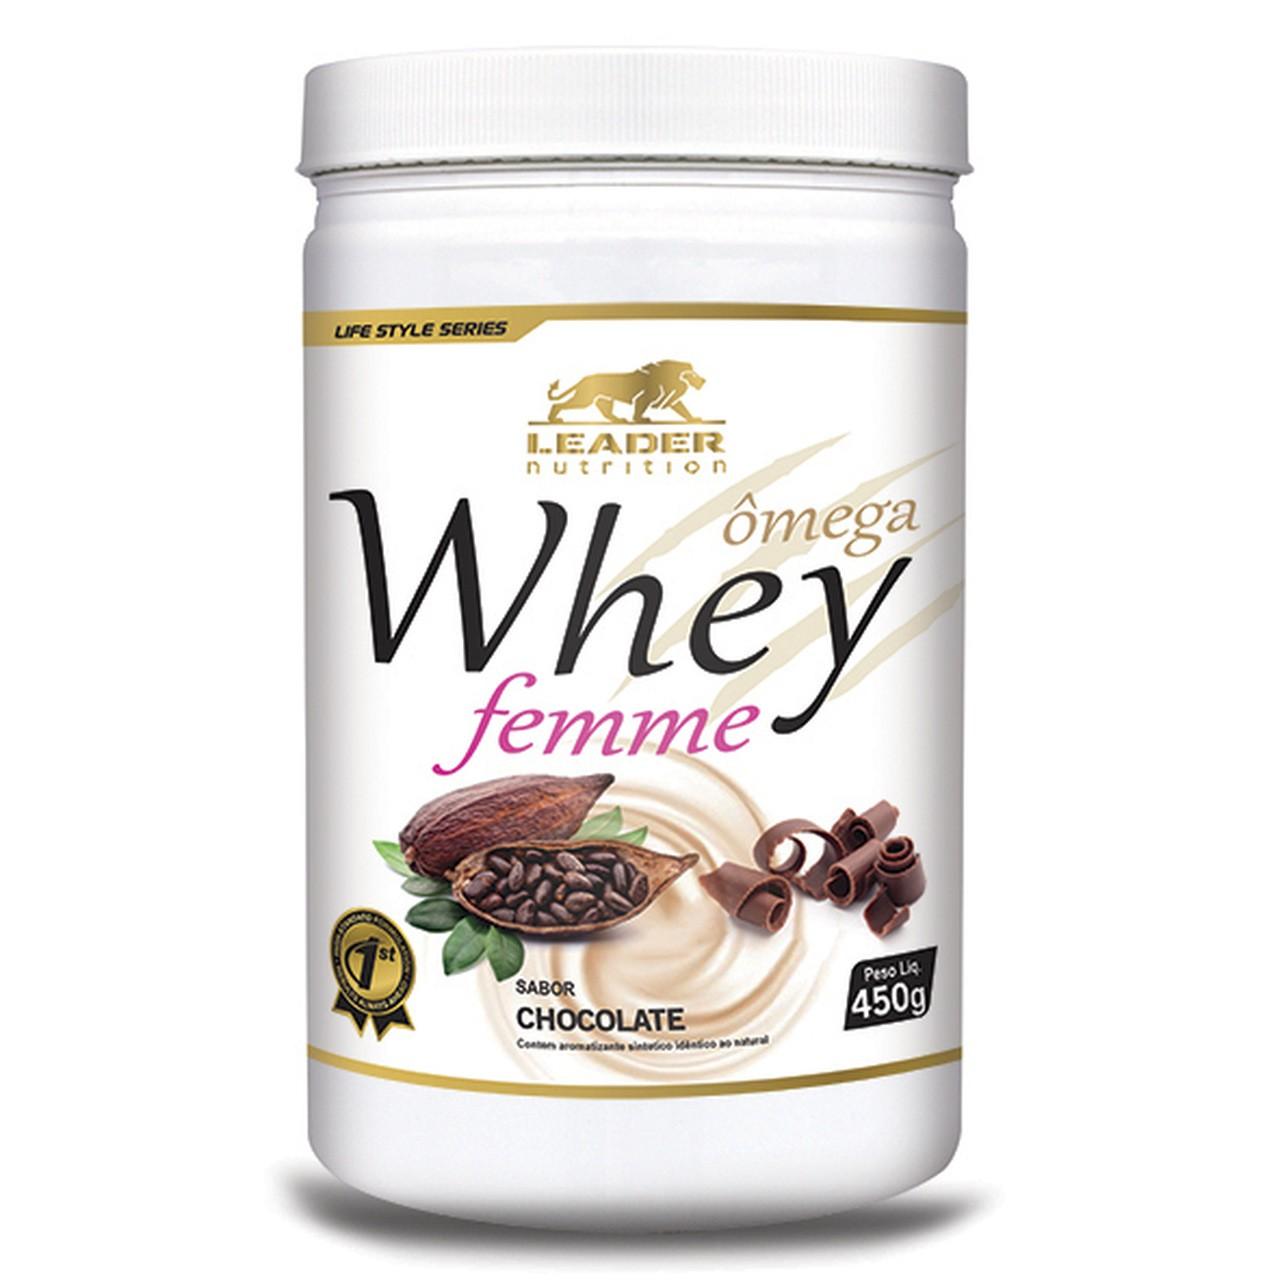 Whey Femme (450g) - Leader Nutrition